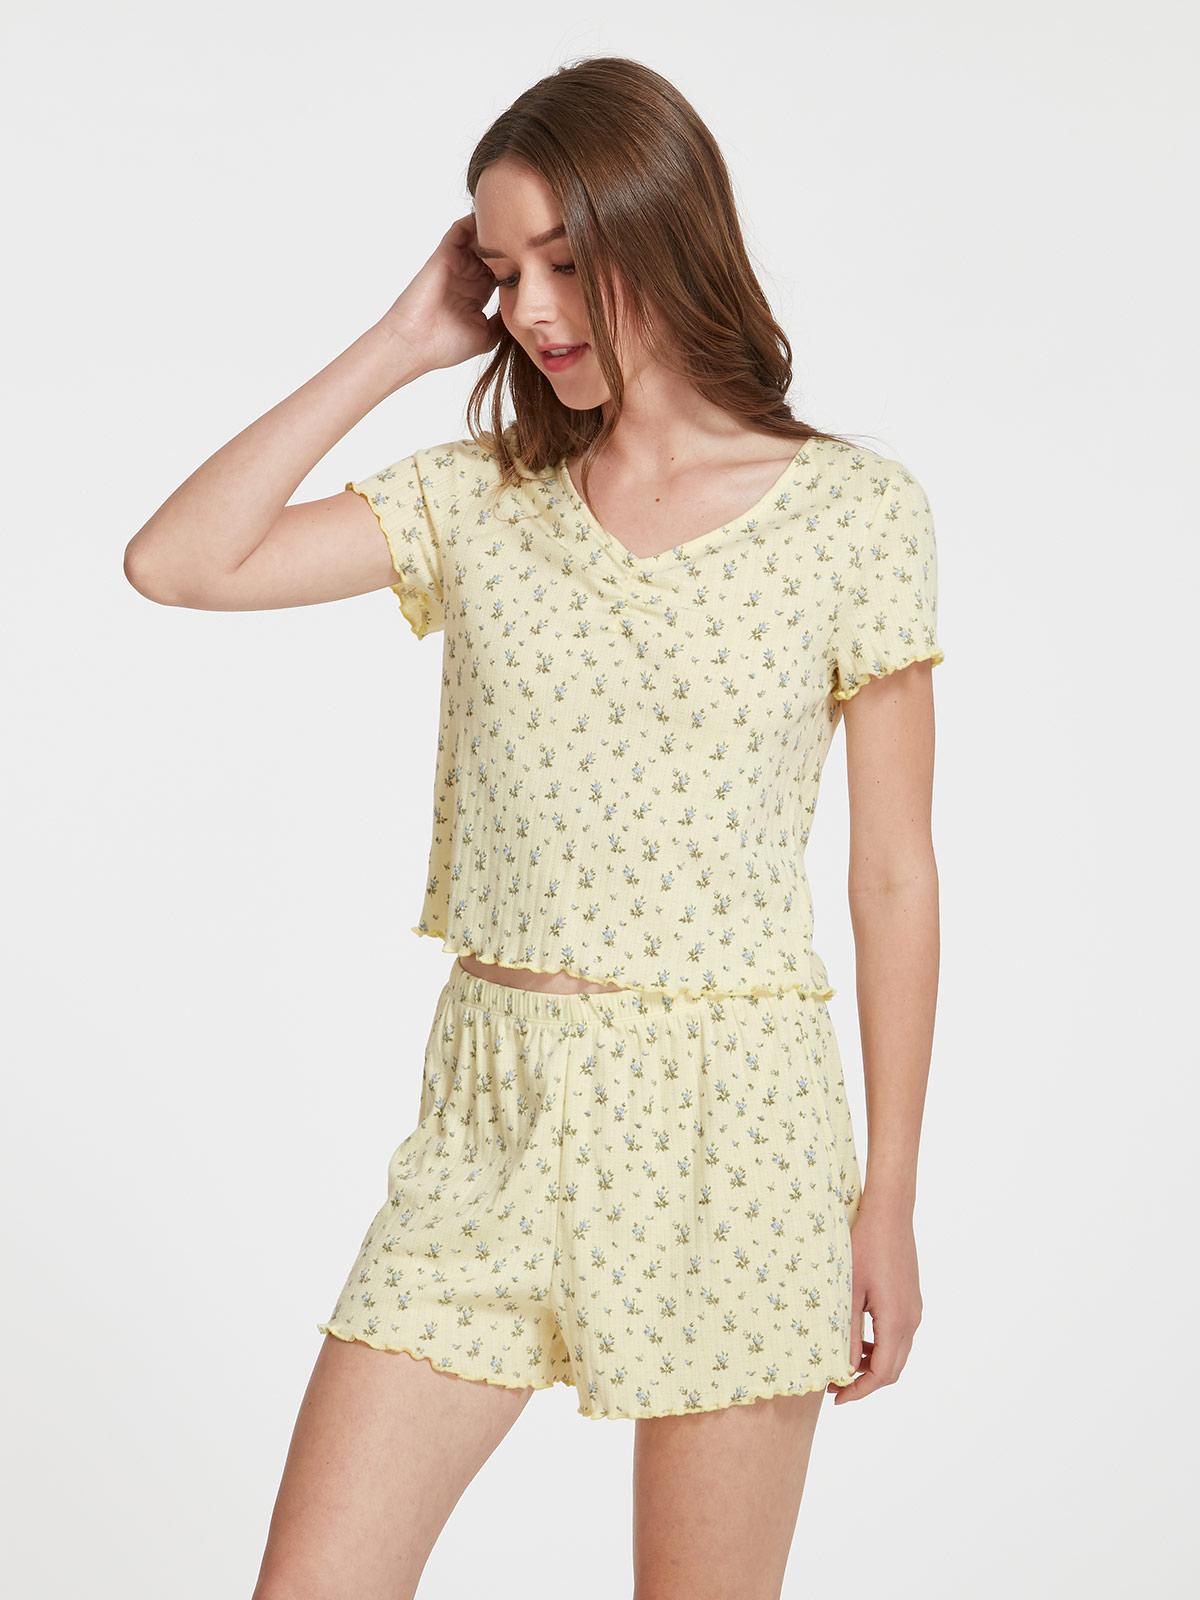 PATTY, 提花家居上衣 HW08674  原價:HK$ 99.0 | 現售:HK$ 79.90